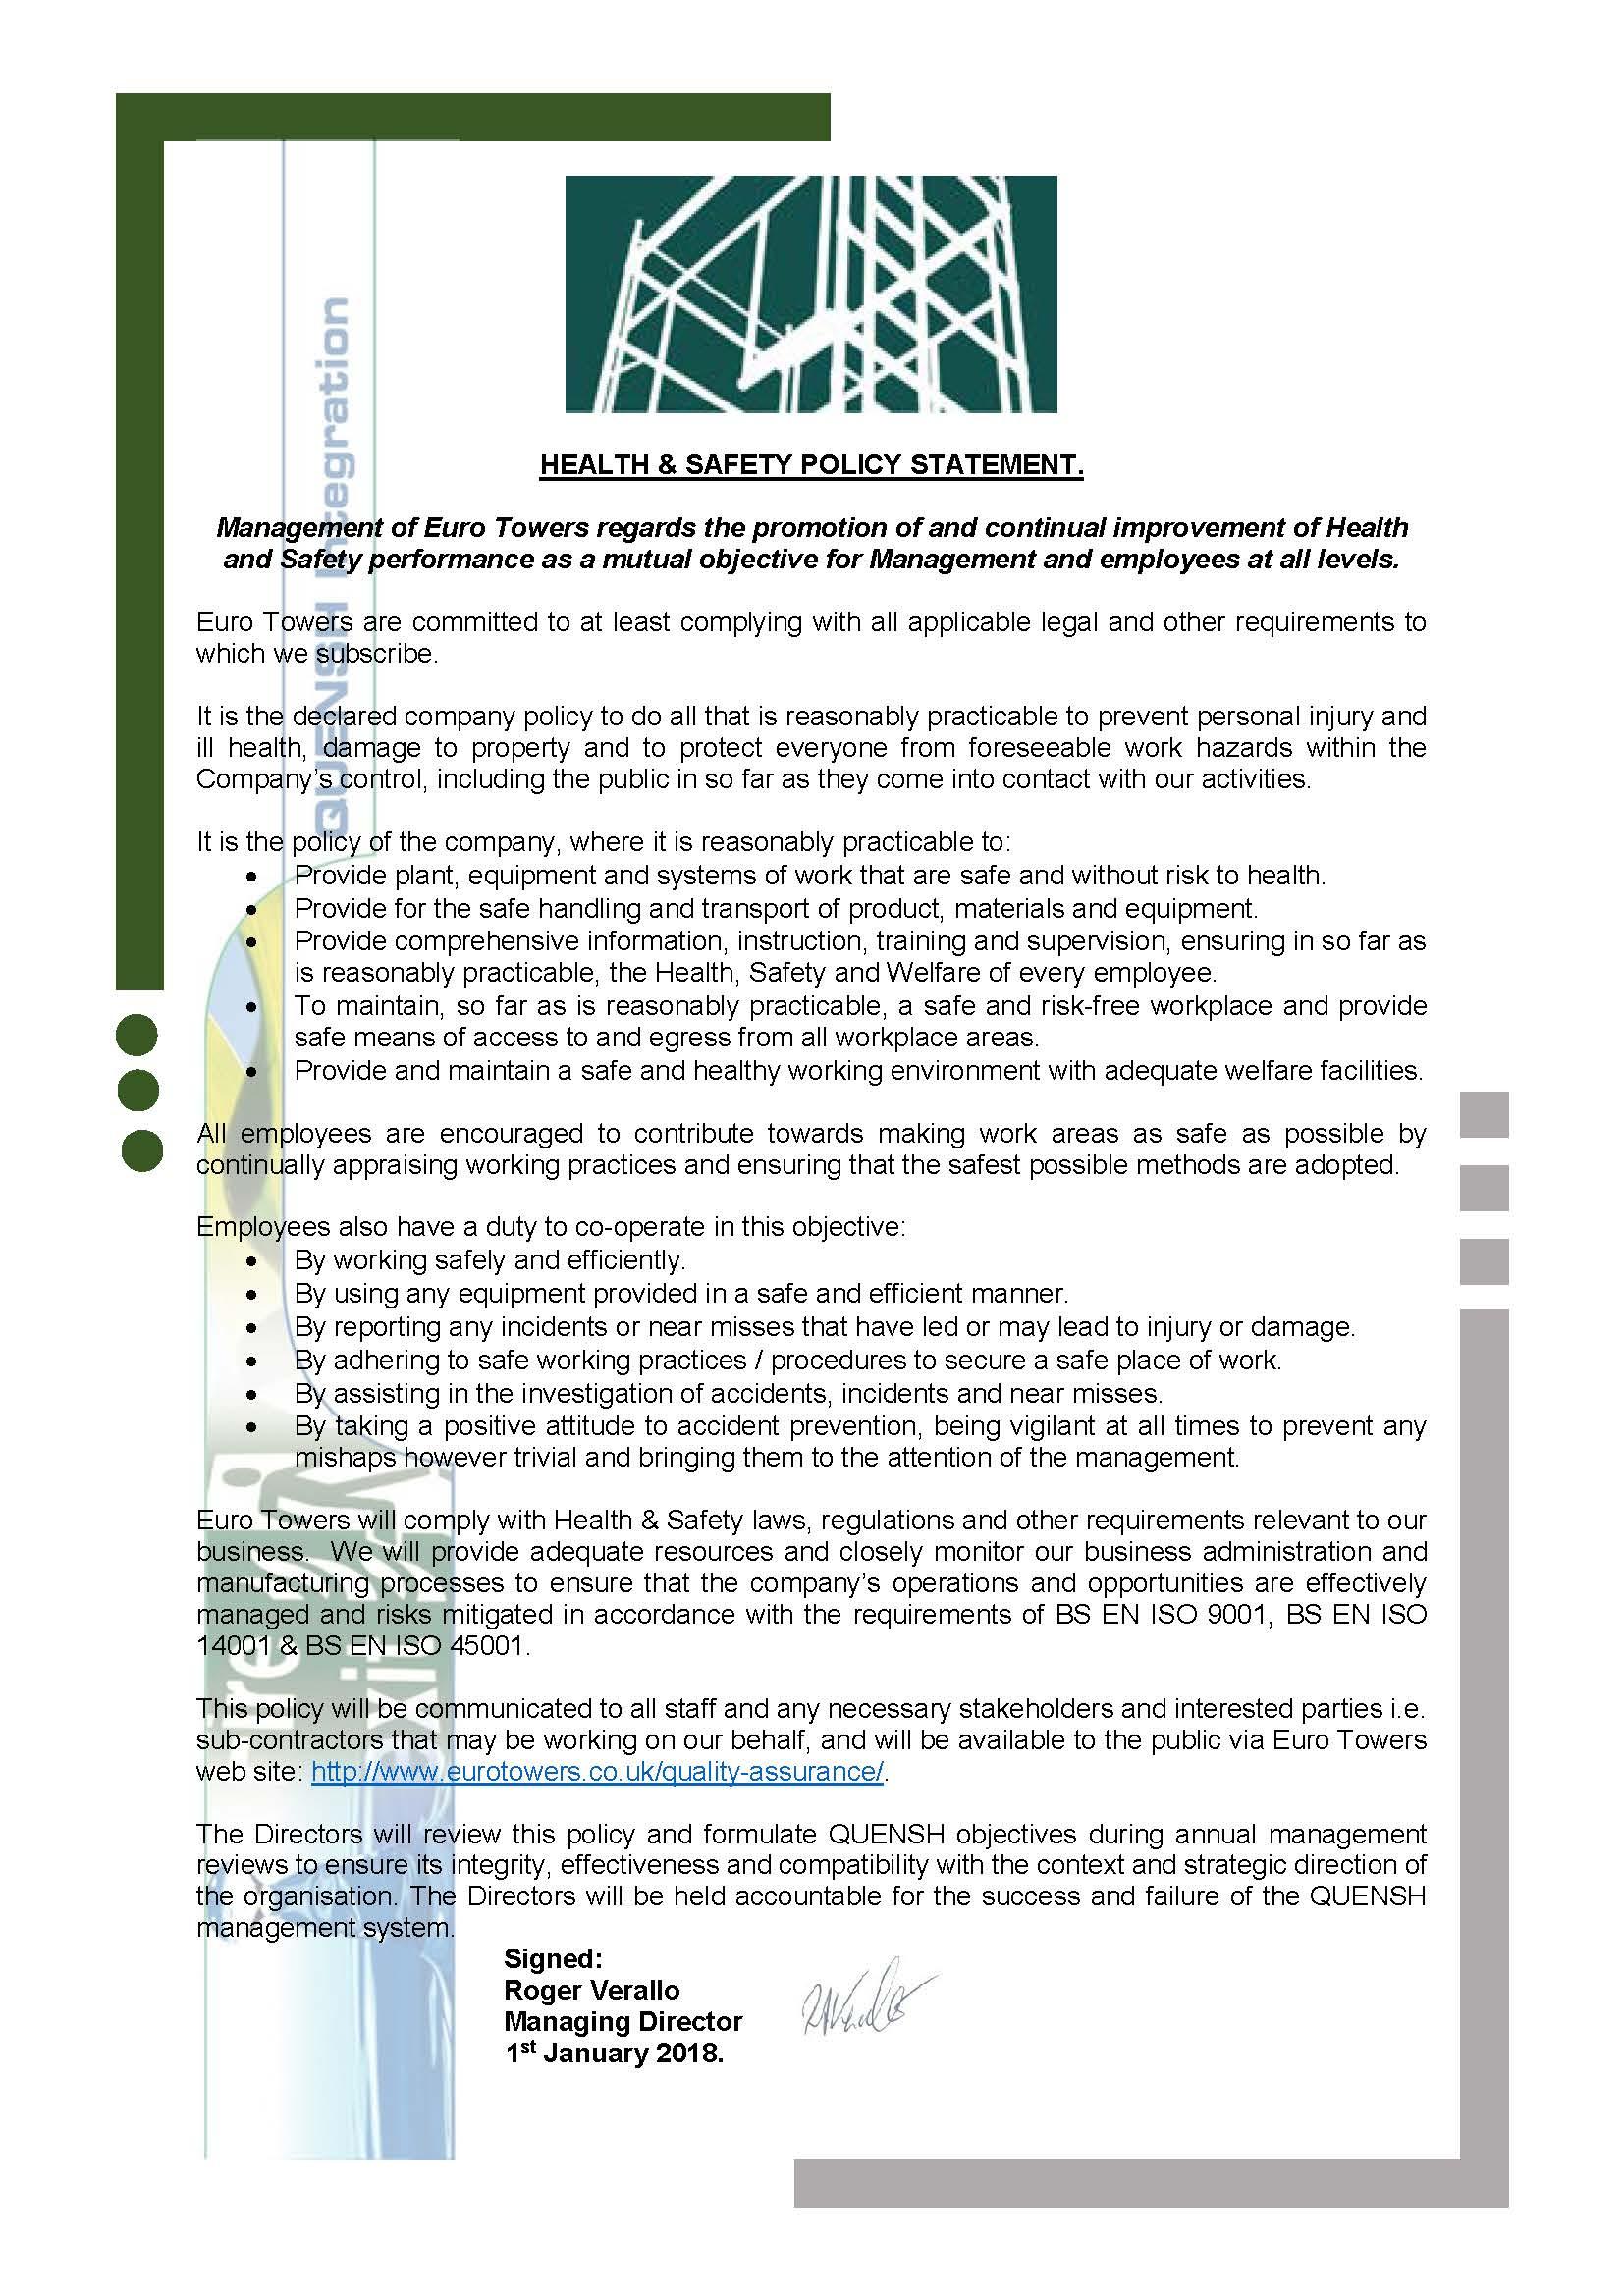 Health & Safety Policy Statement